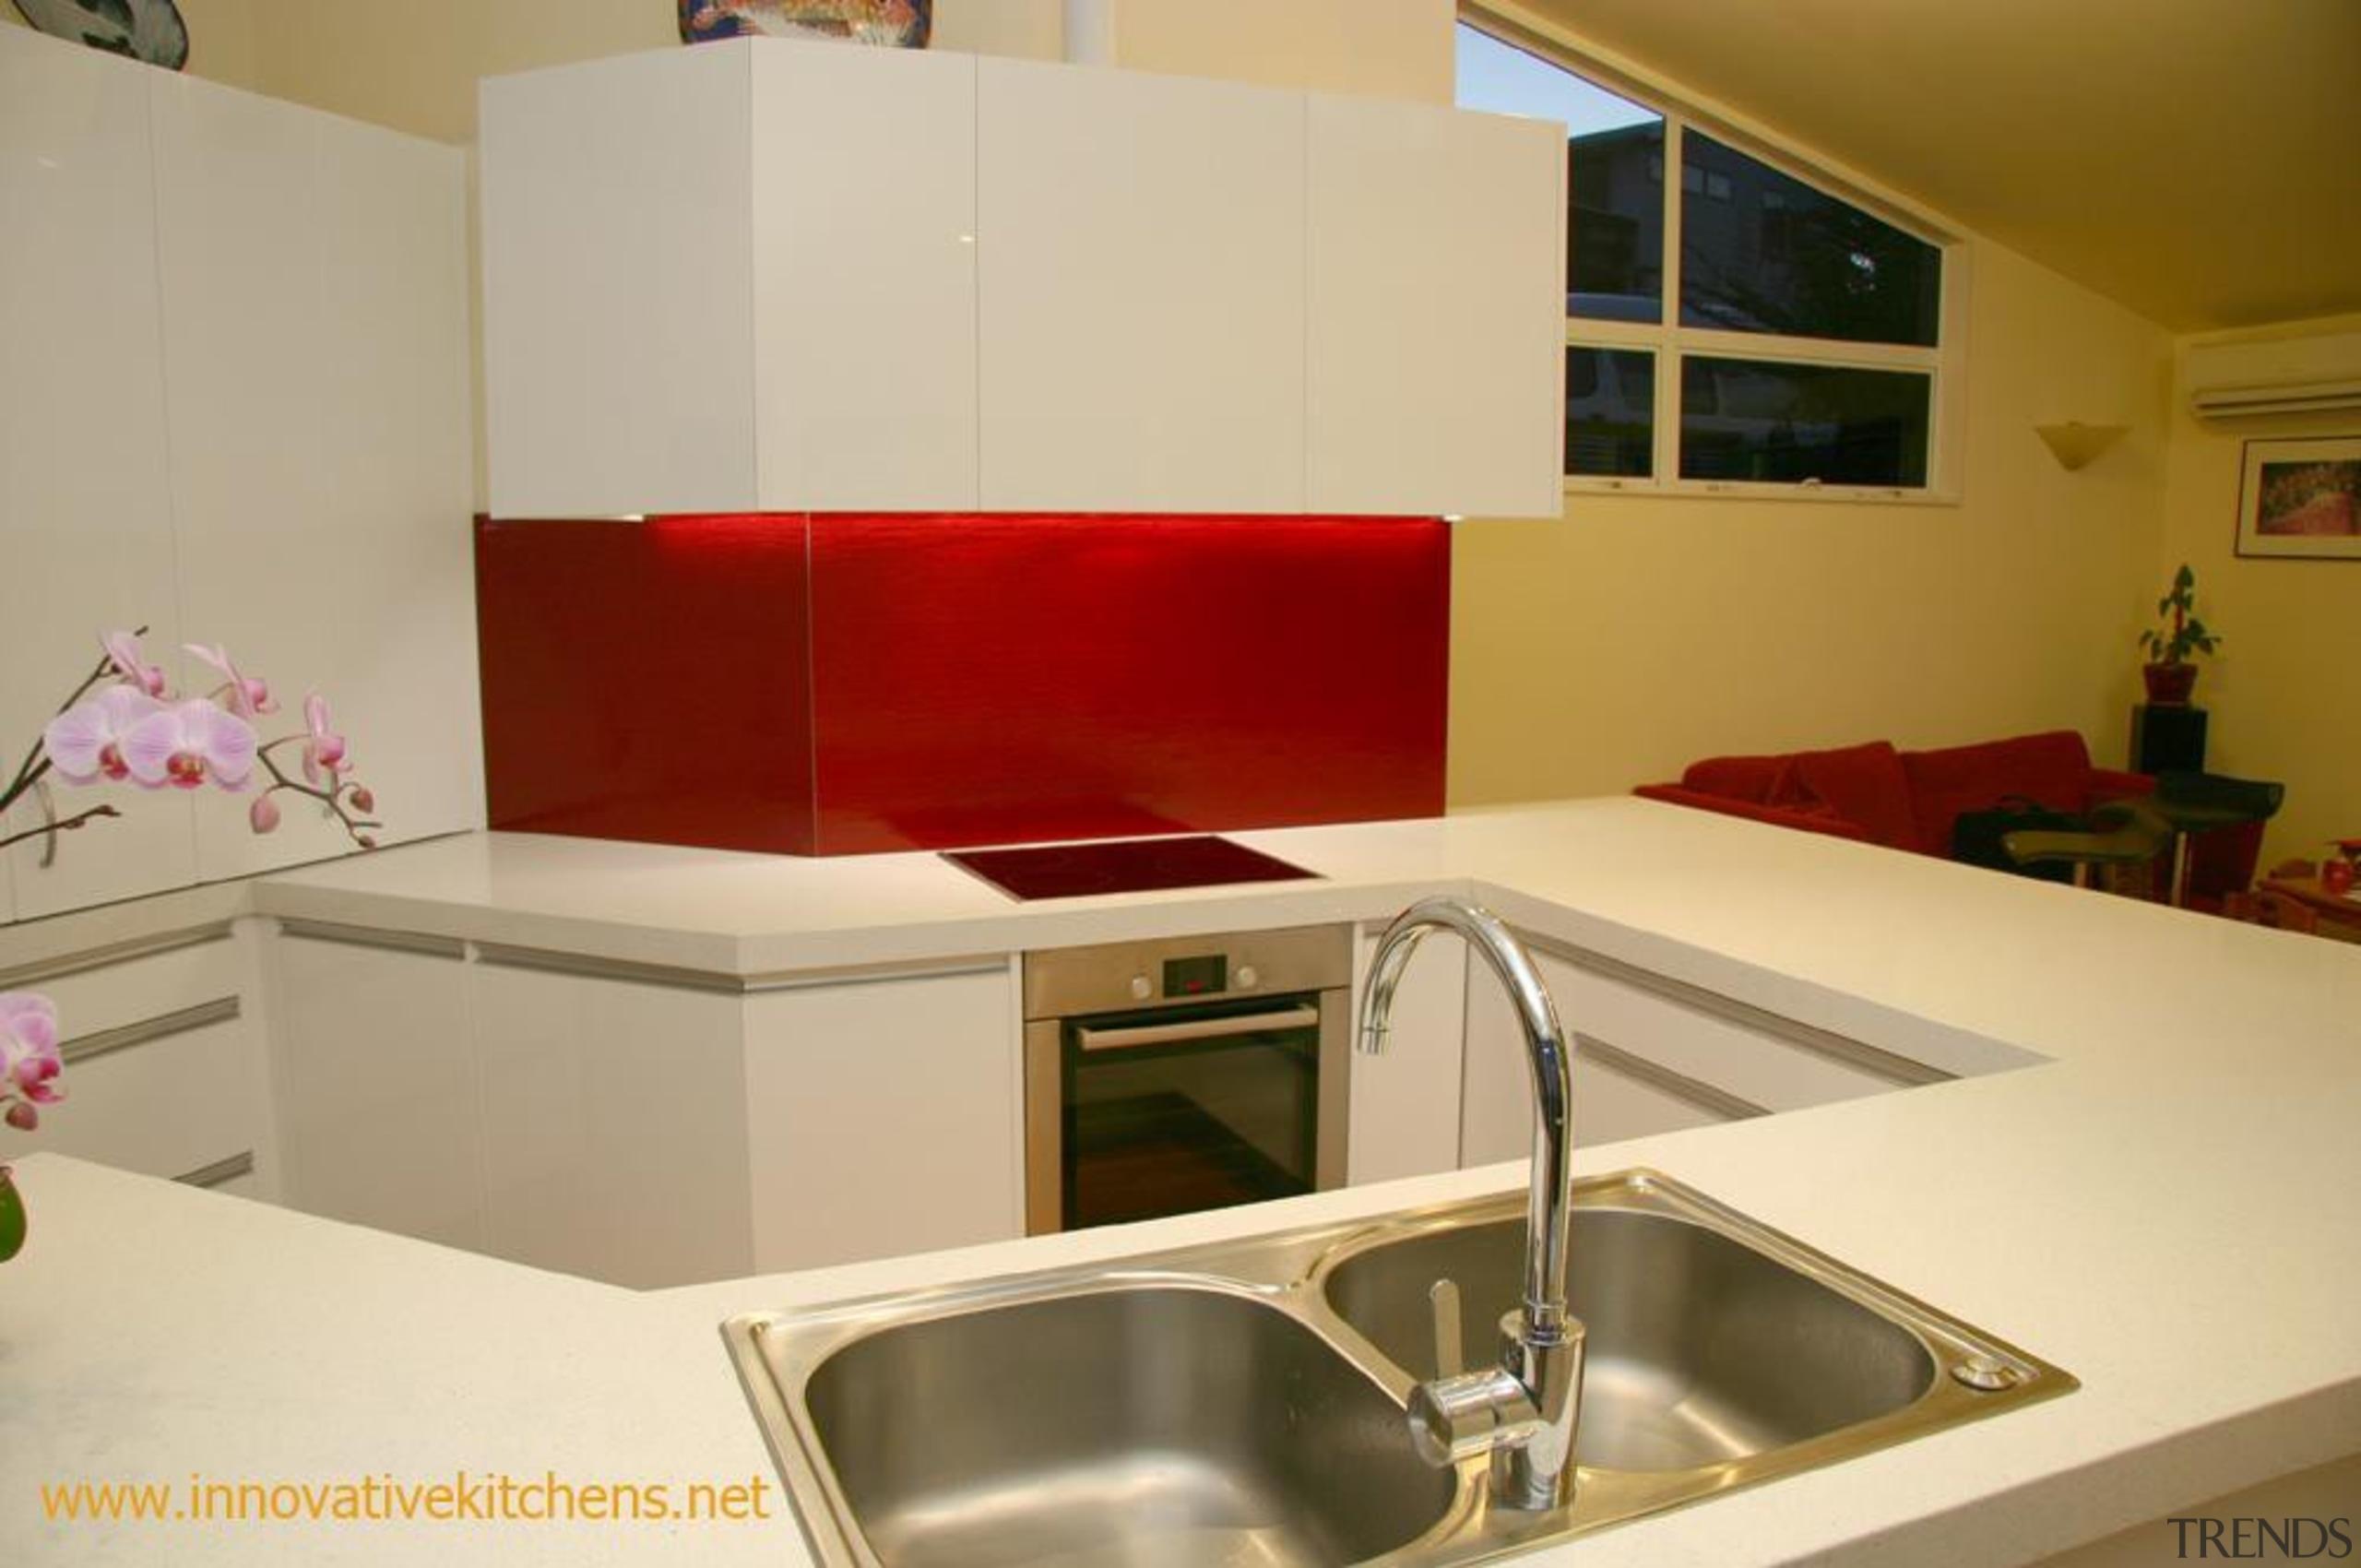 18 modern hillsborough 2012 3.jpg - 18_modern_hillsborough_2012_3.jpg - countertop, interior design, kitchen, property, real estate, room, orange, brown